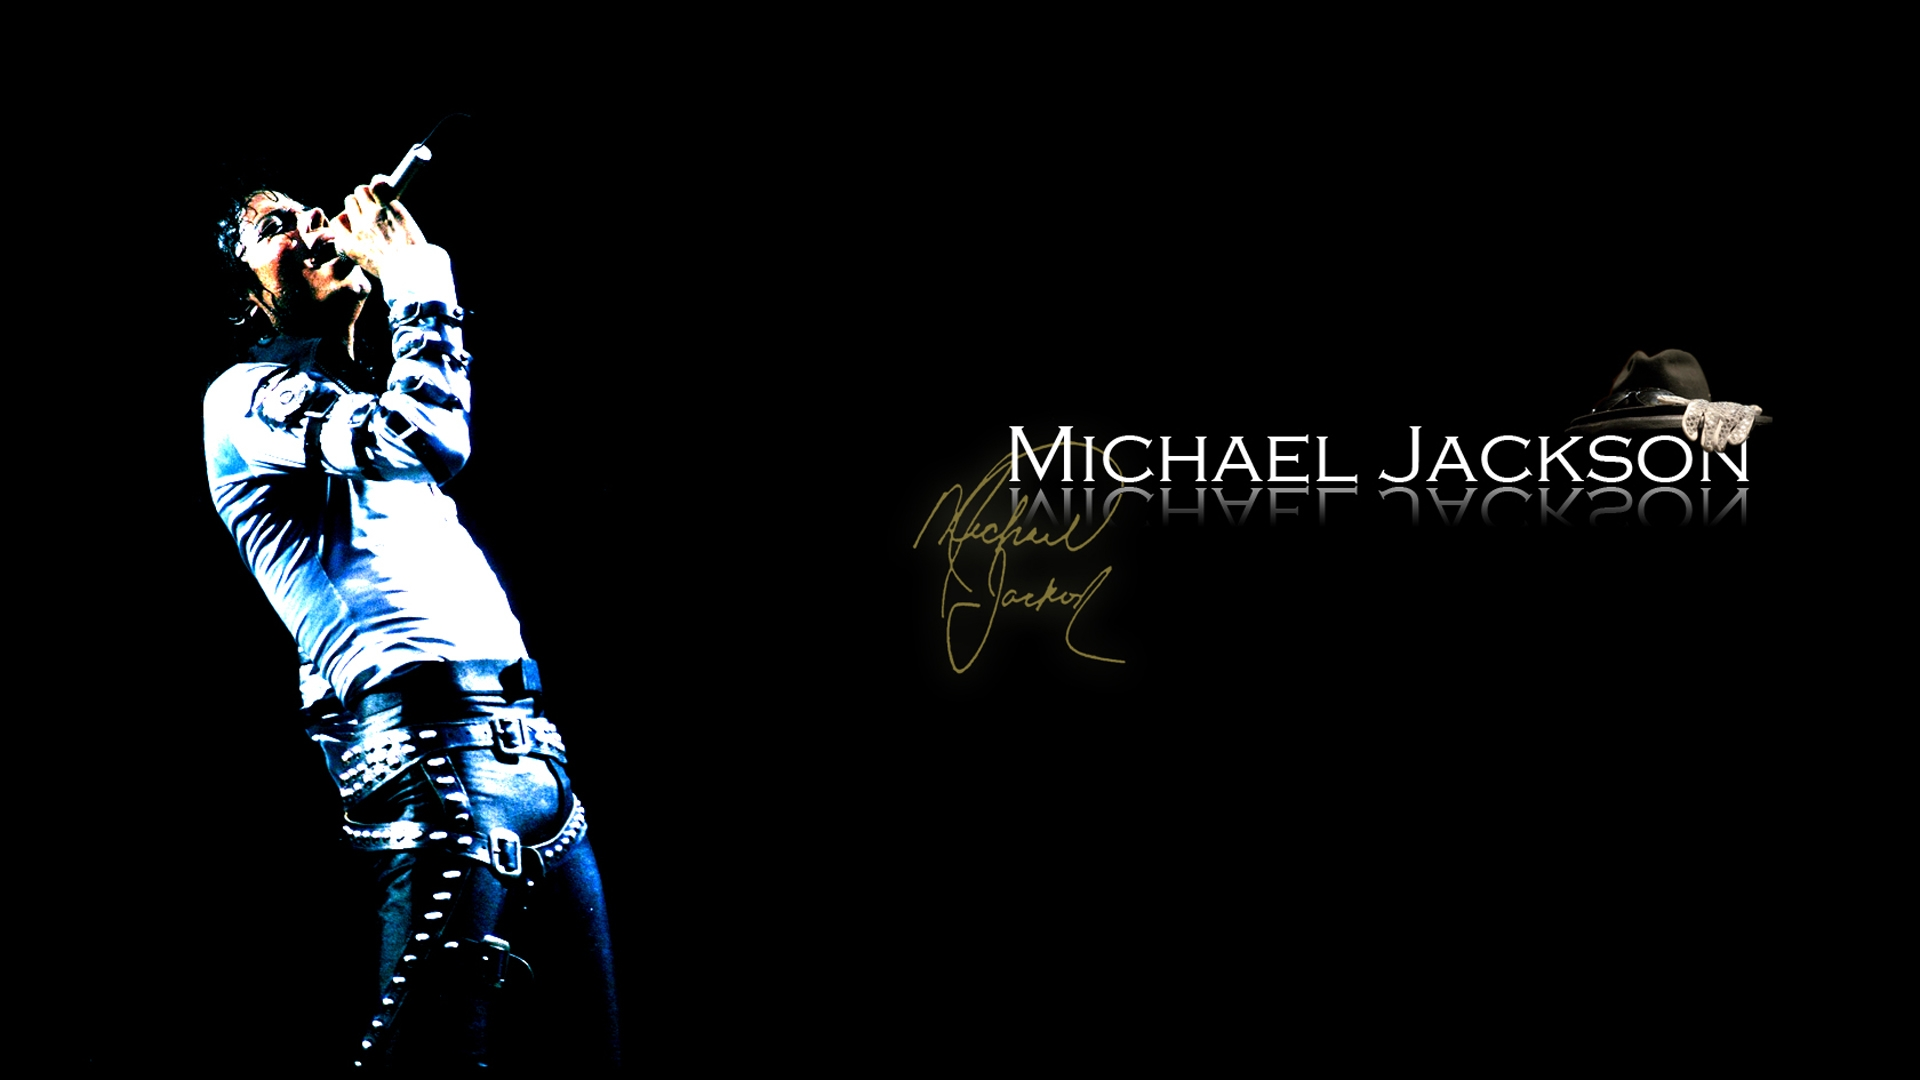 Michael Jackson The Legend - Wallpapers ~ CrackModo